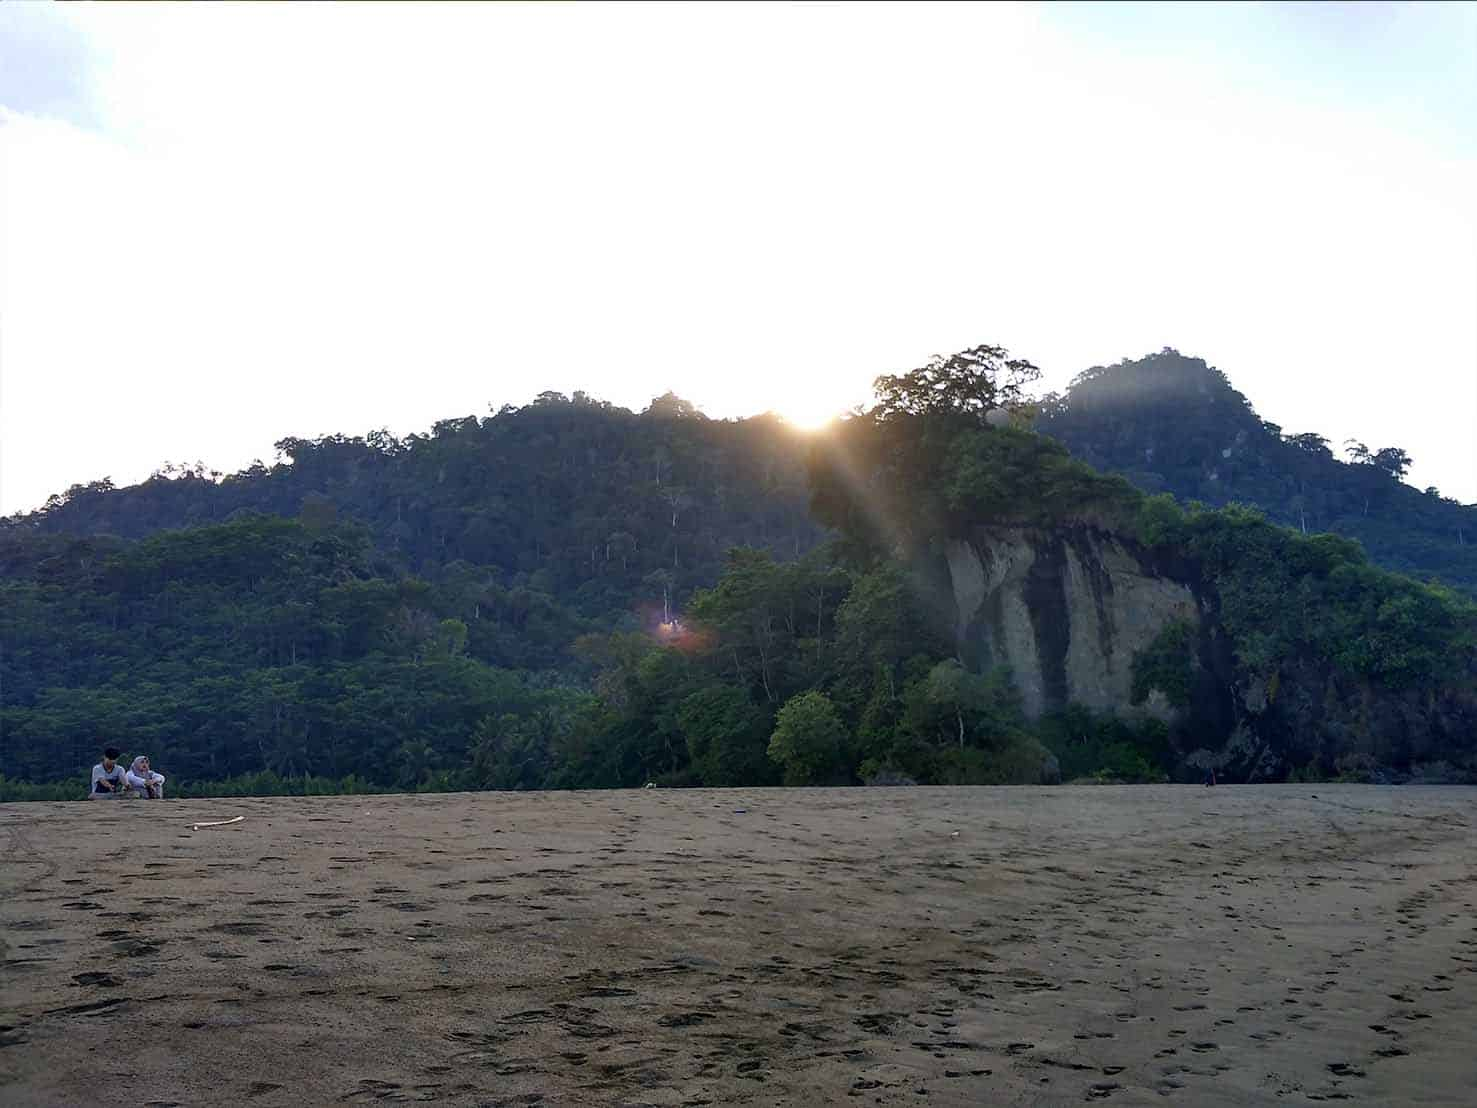 Sekilas Cerita Pantai Sipelot Lingkar Malang Bertetangga Kawasan Lenggoksono Banyu